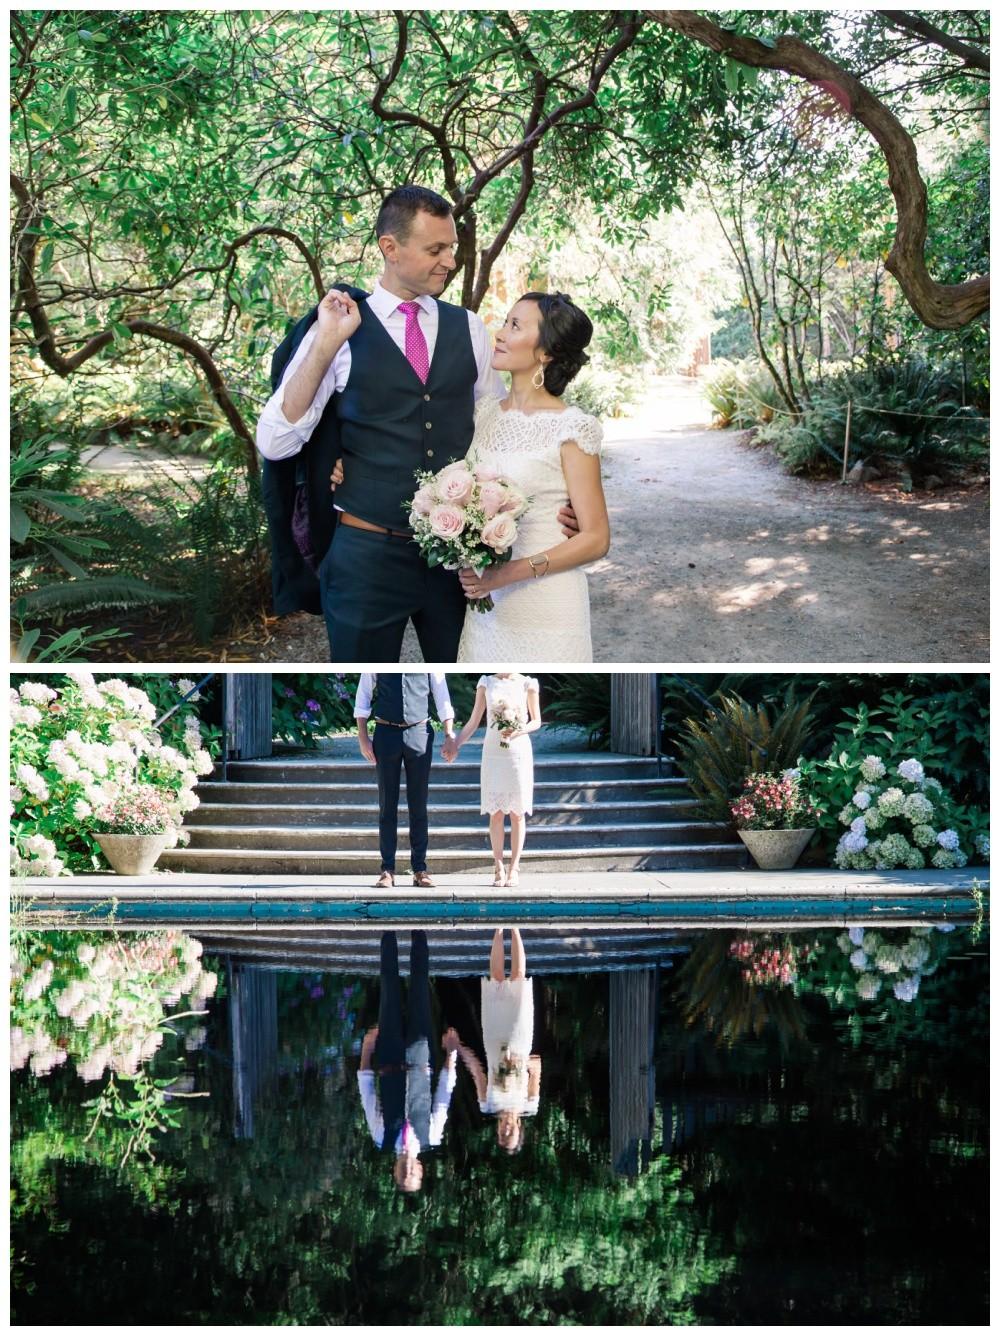 Bride and groom at Milner Gardens - Intimate Wedding Vendors Qualiucm